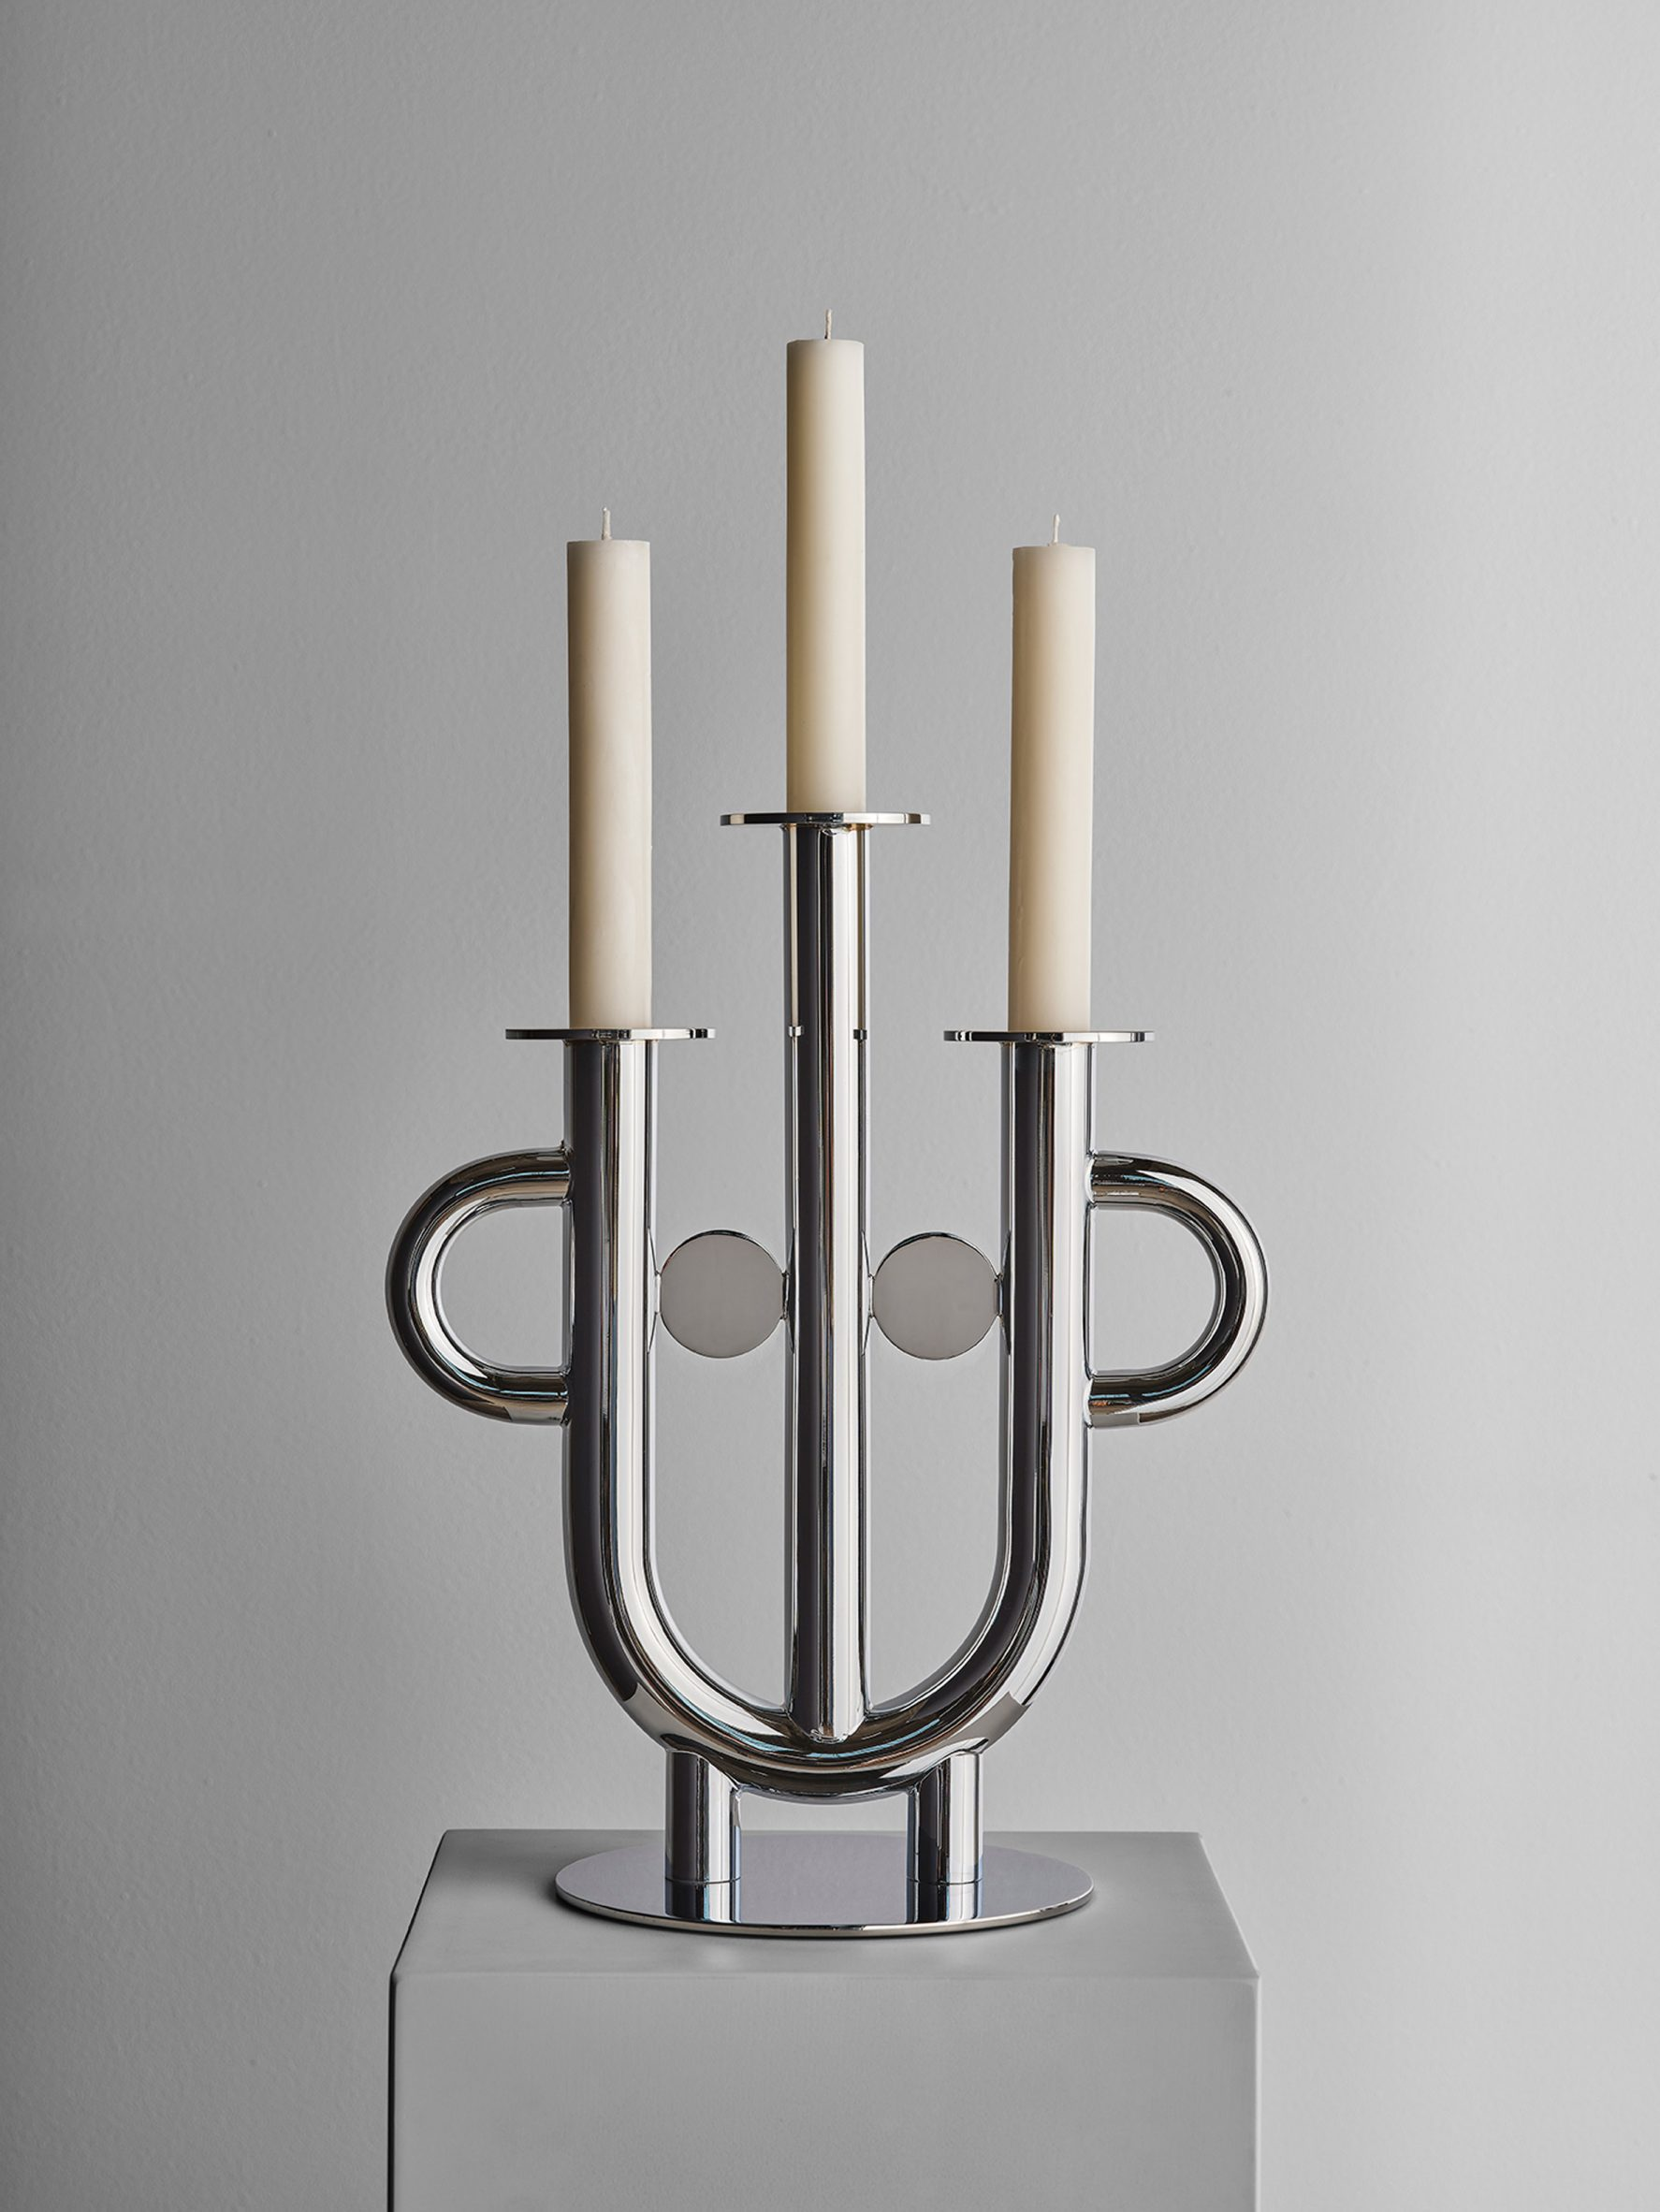 Jaime Hayon face-shaped candelabra